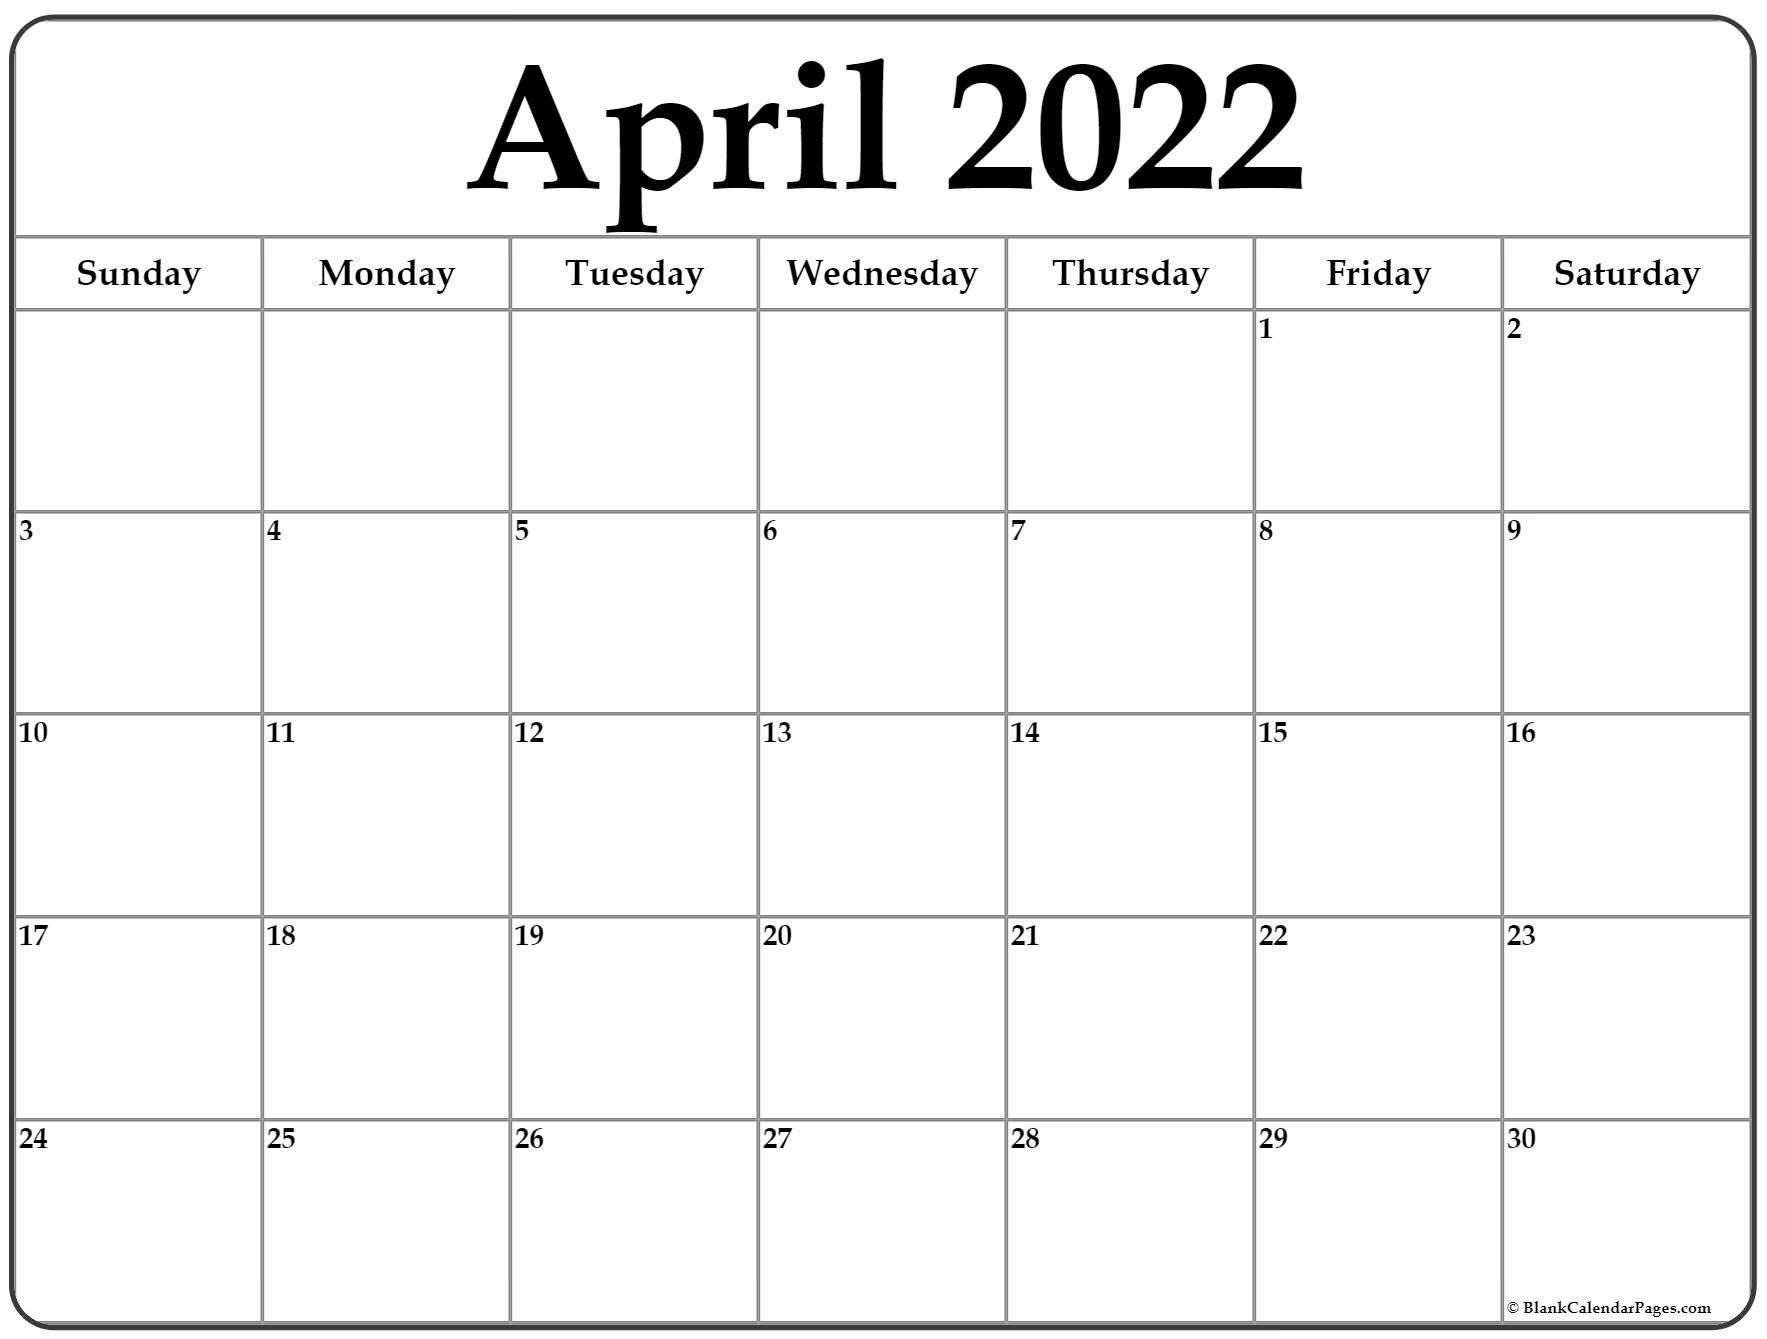 April 2022 Calendar   Free Printable Calendar Templates within April 2022 Printable Calendar Free 2022